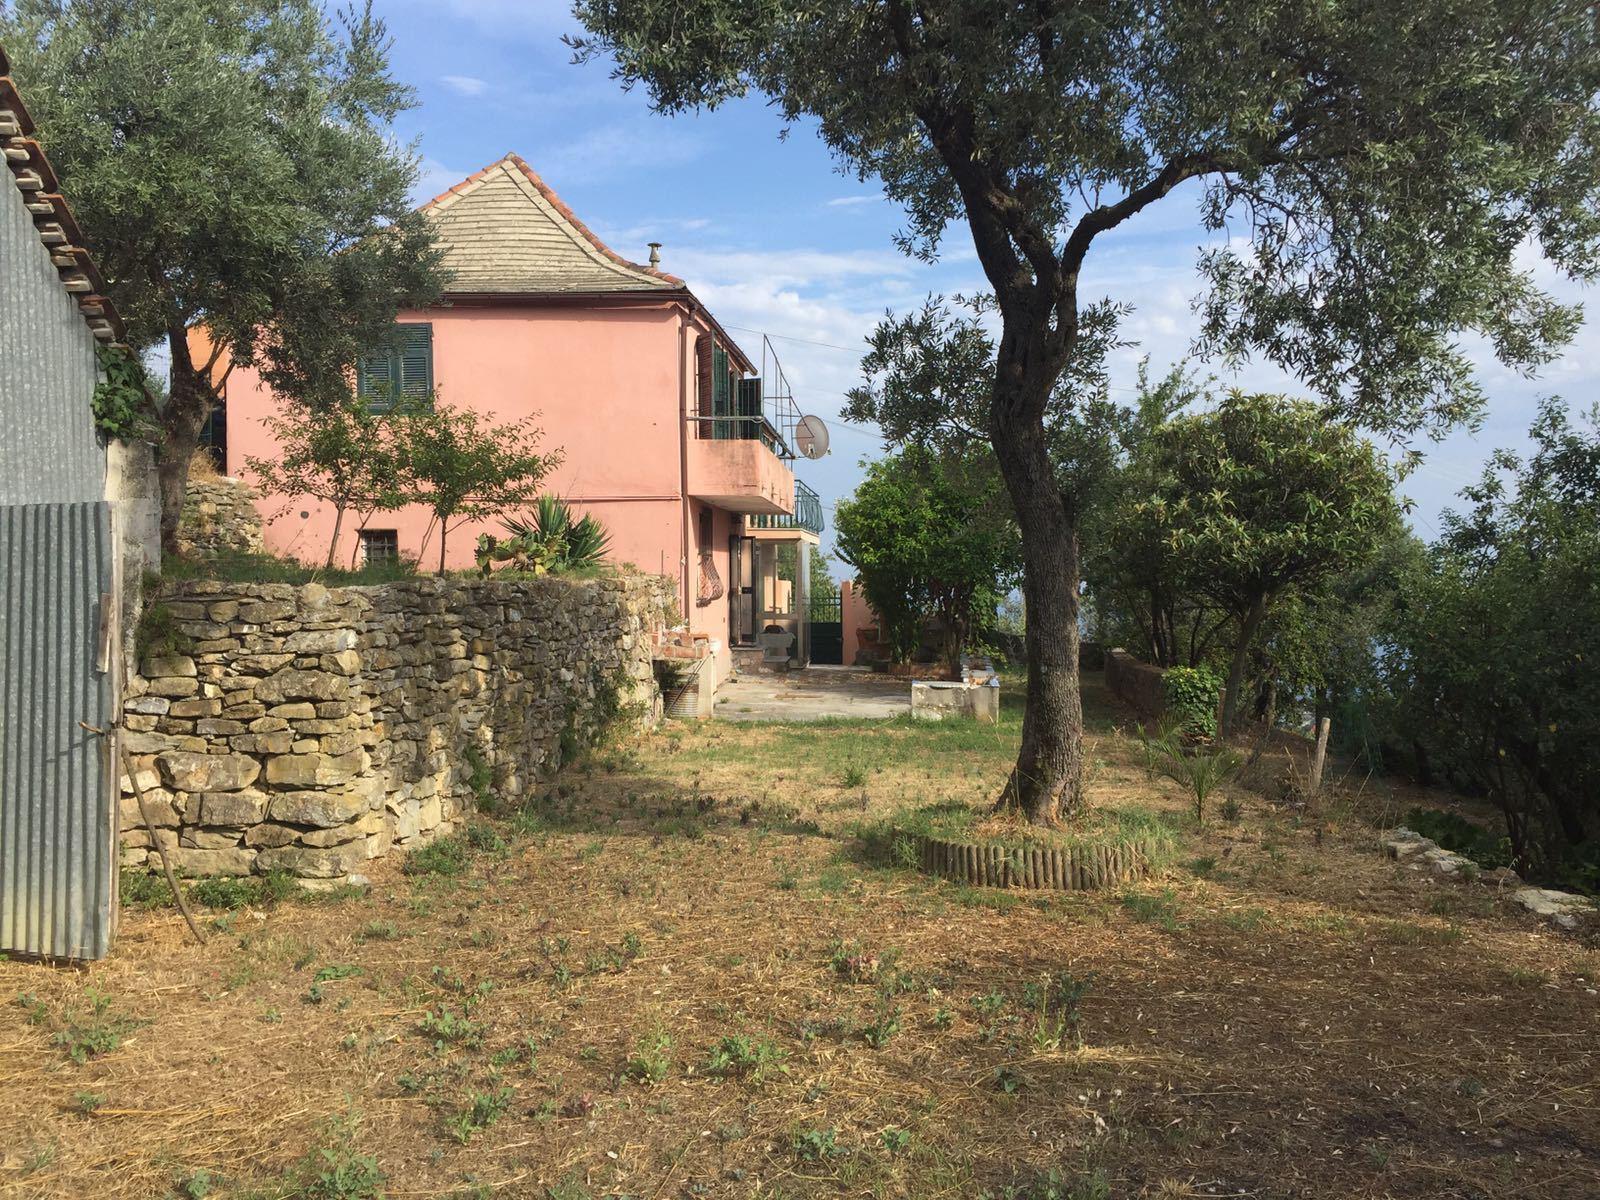 Casa Con Giardino Rovereto : Rif case villa o casa semi indipendente in vendita a